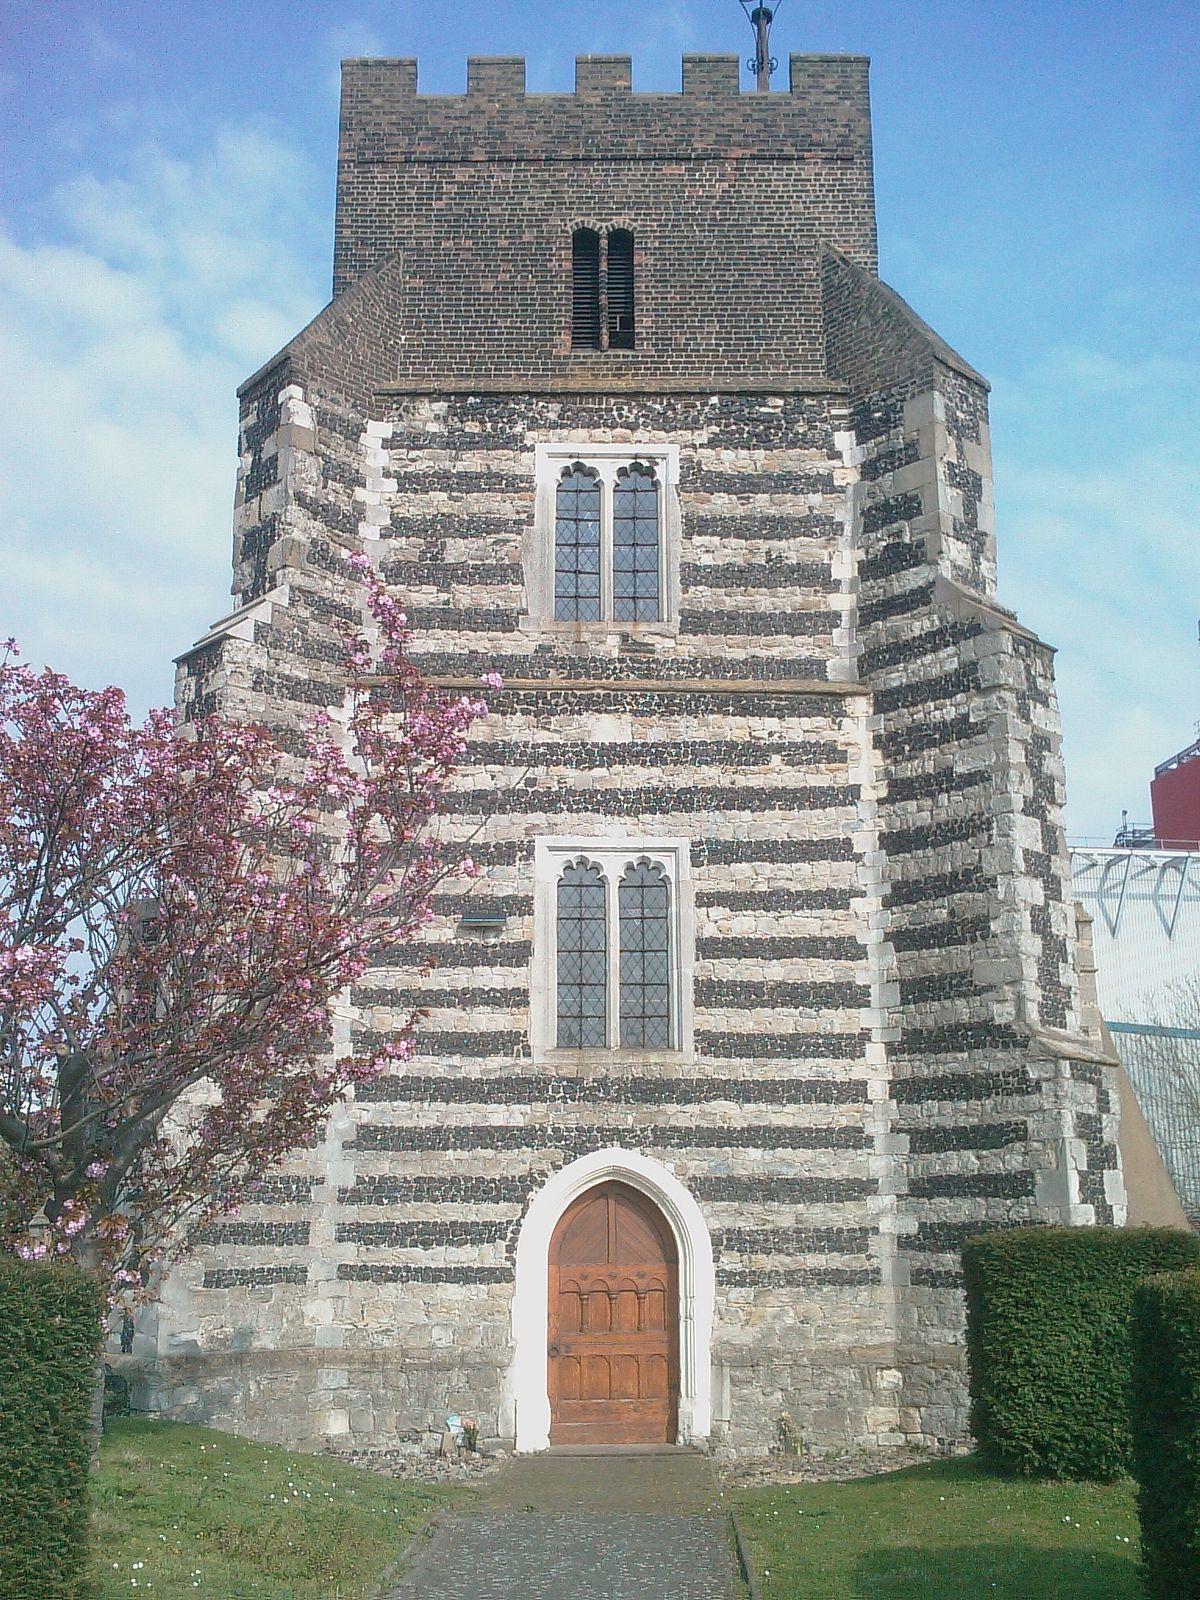 St. Clement's Church - Wikidata